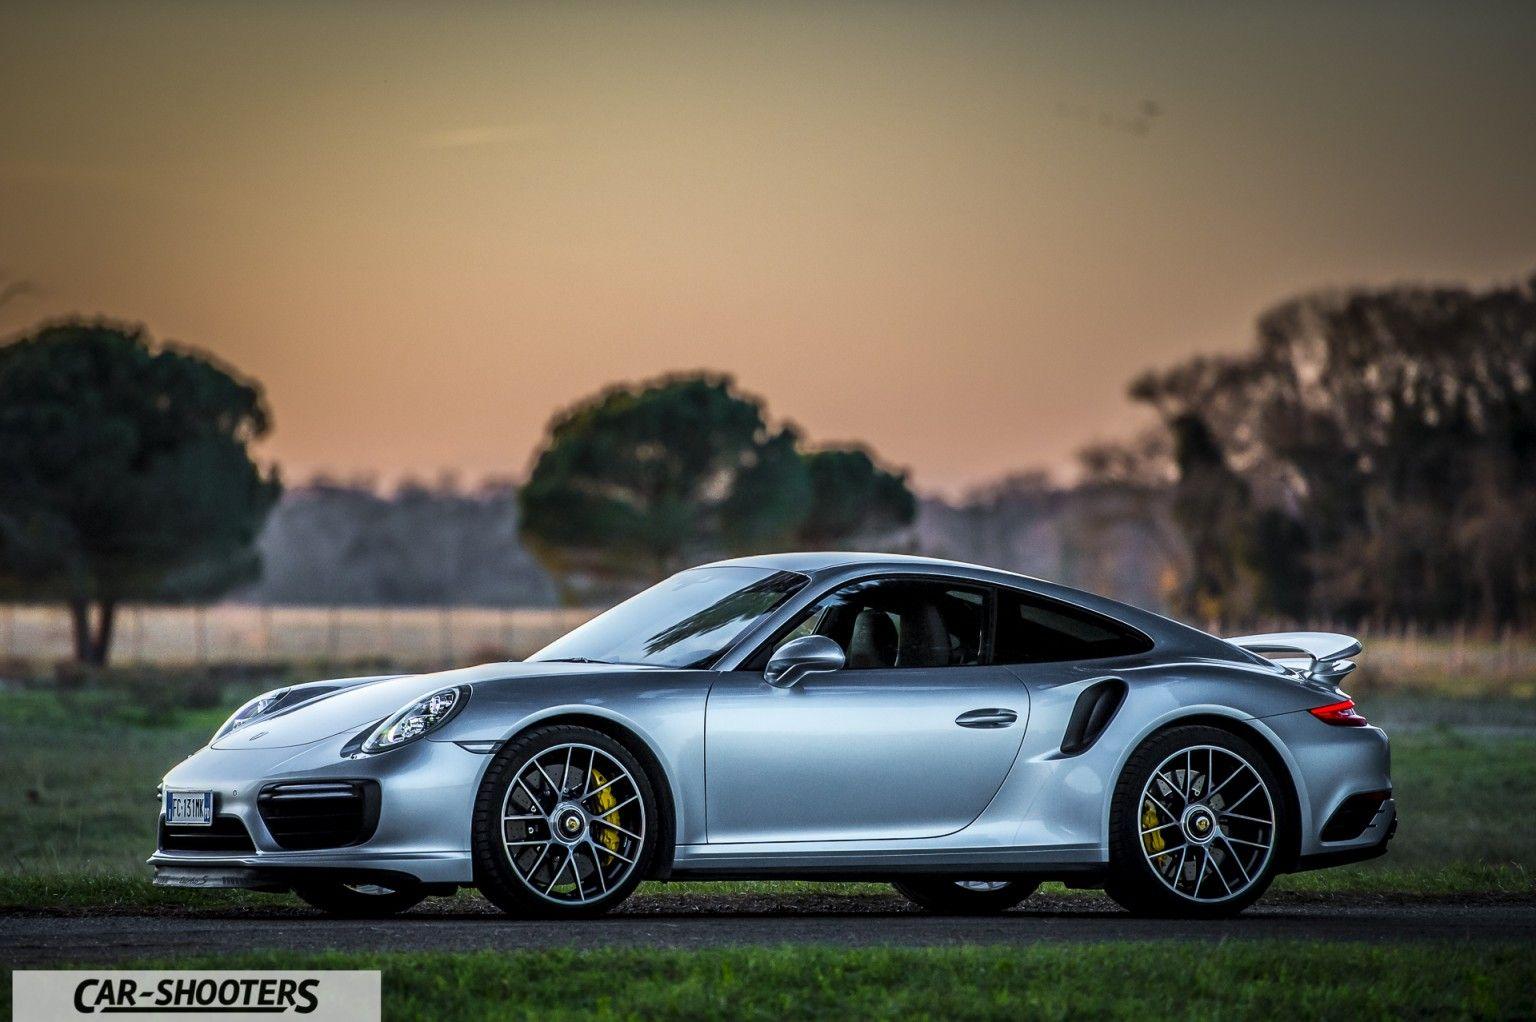 car_shooters_porsche_911_turbo_s_51